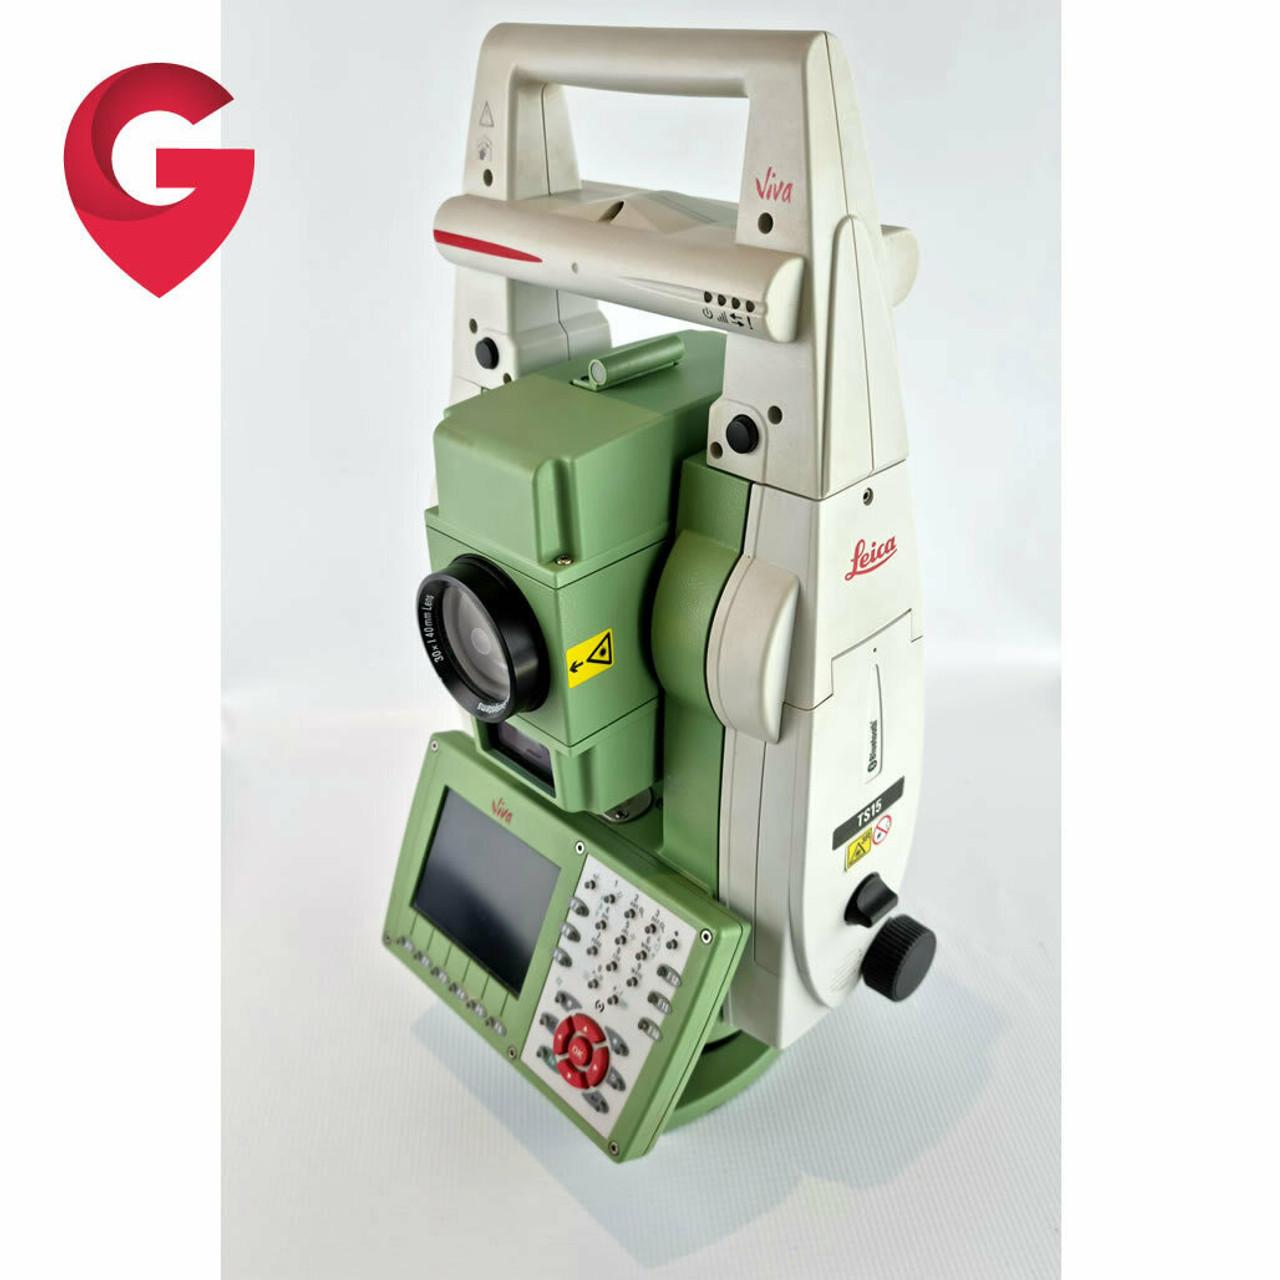 "Leica TS15 P 3"" R1000 Robotic Total Station & CS15 - Used"